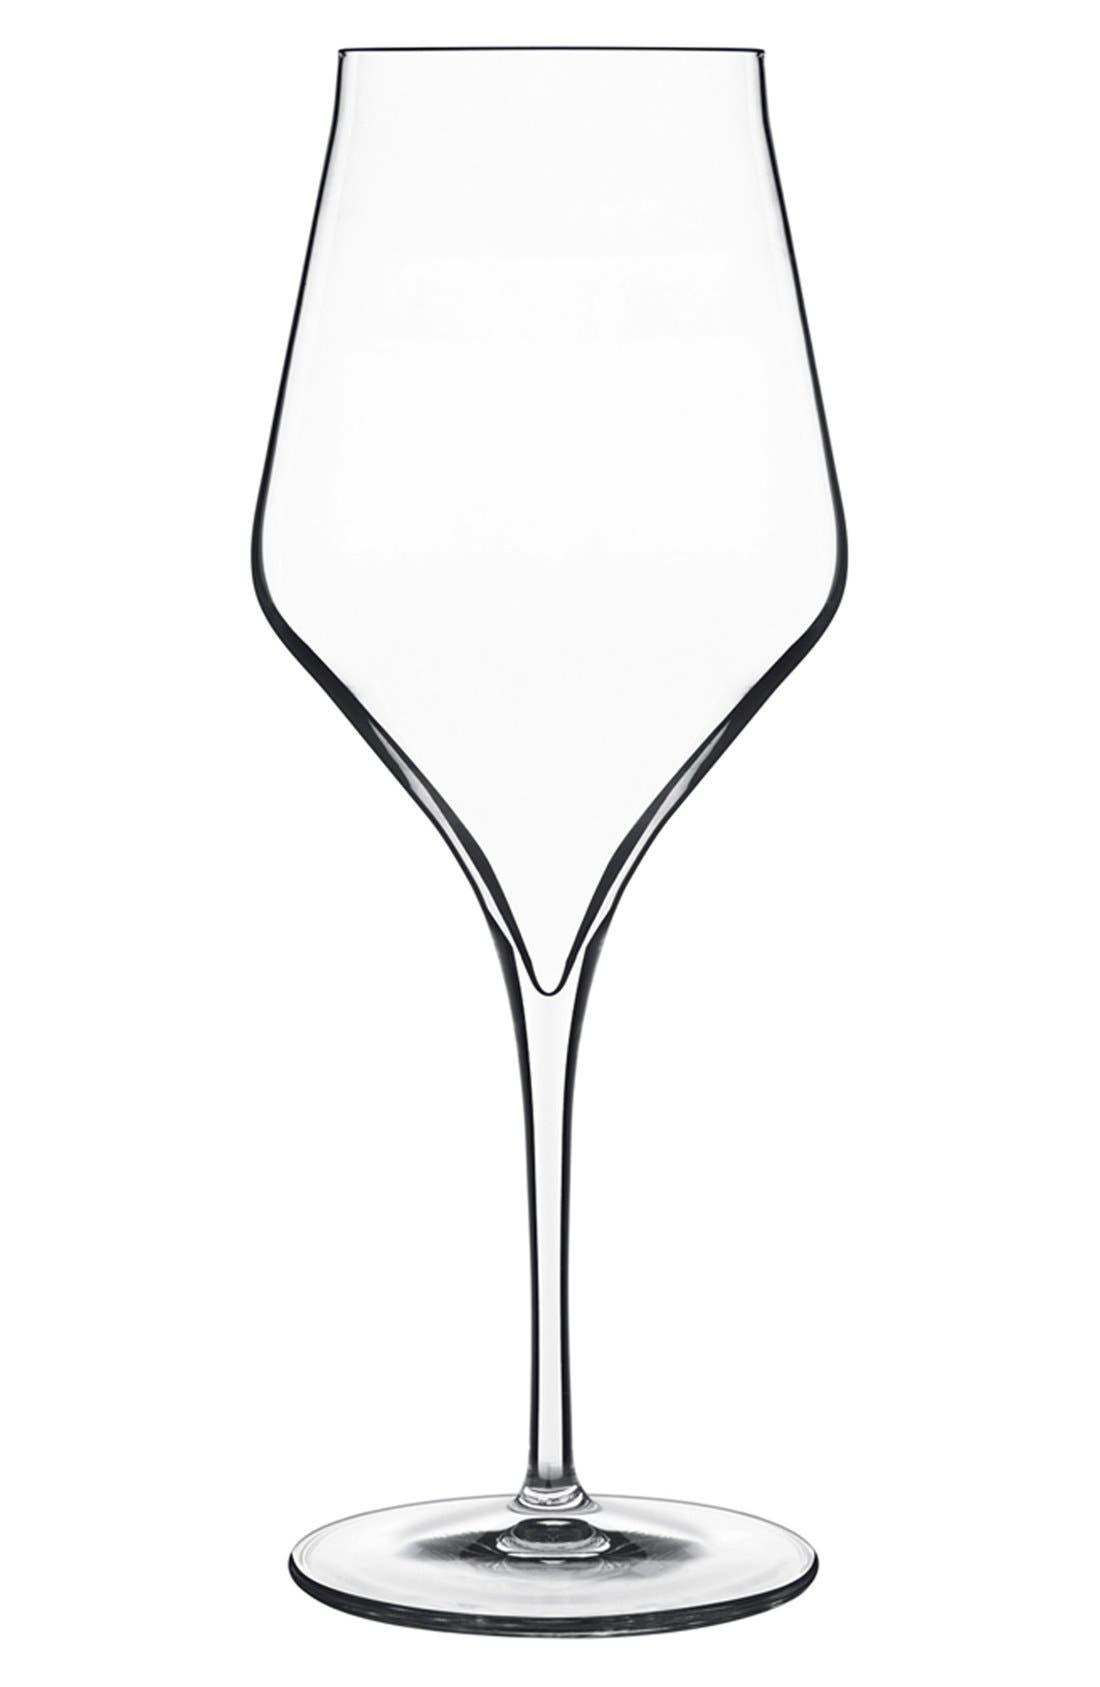 Main Image - Luigi Bormioli 'Supremo' Bordeaux Wine Glasses (Set of 6)